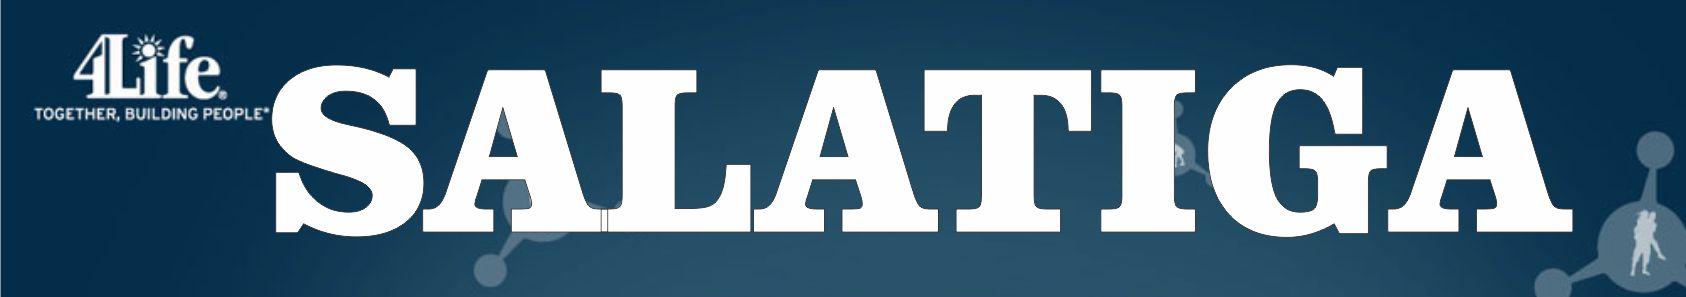 Distributor-4Life-Transfer-Factor-Salatiga